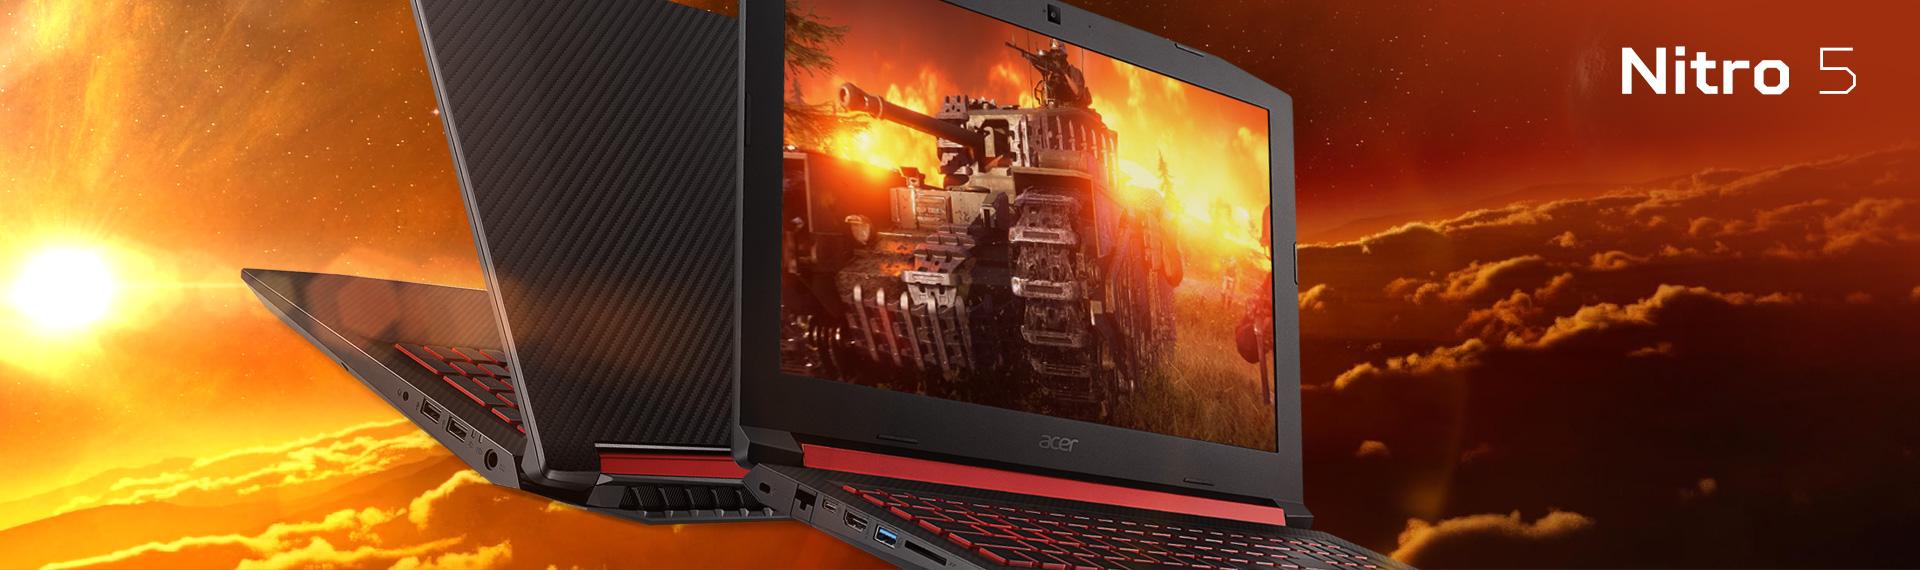 Ini Spesifikasi Laptop Nitro 5 yang Bikin Skill Gaming Maksimal